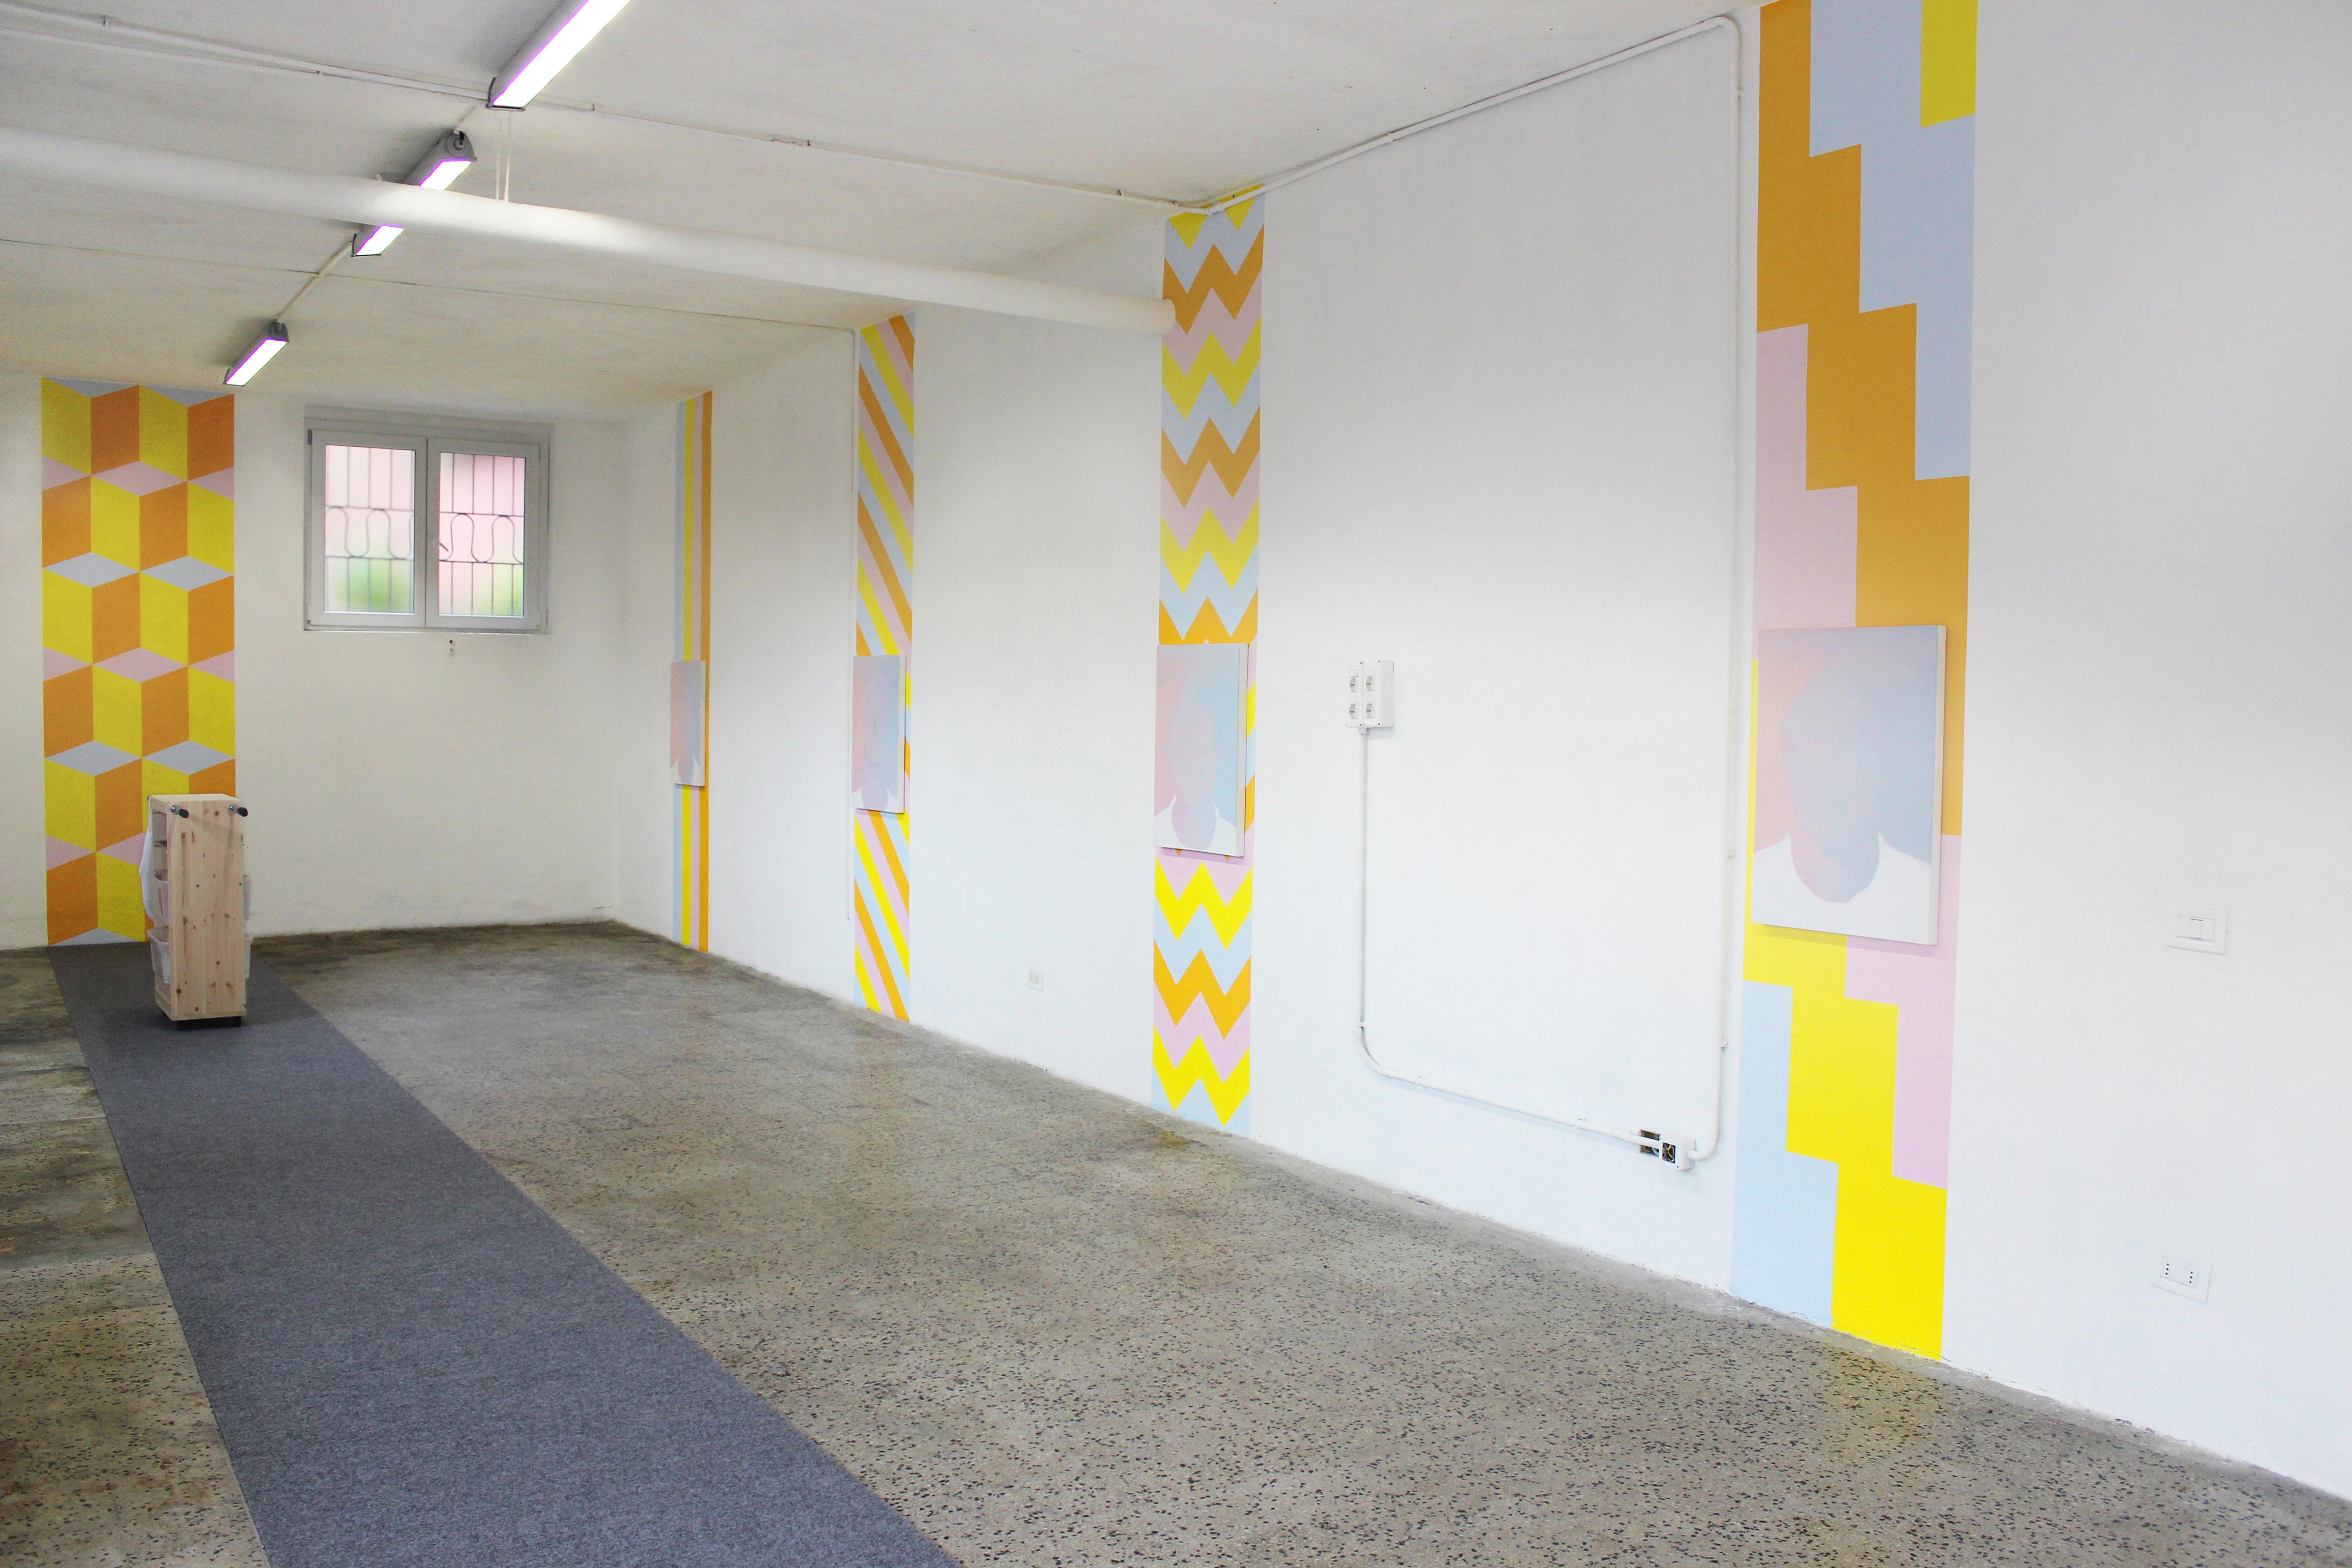 1x1 Guendalina Cerruti & Alessandro Moroni, installation view, courtesy _77